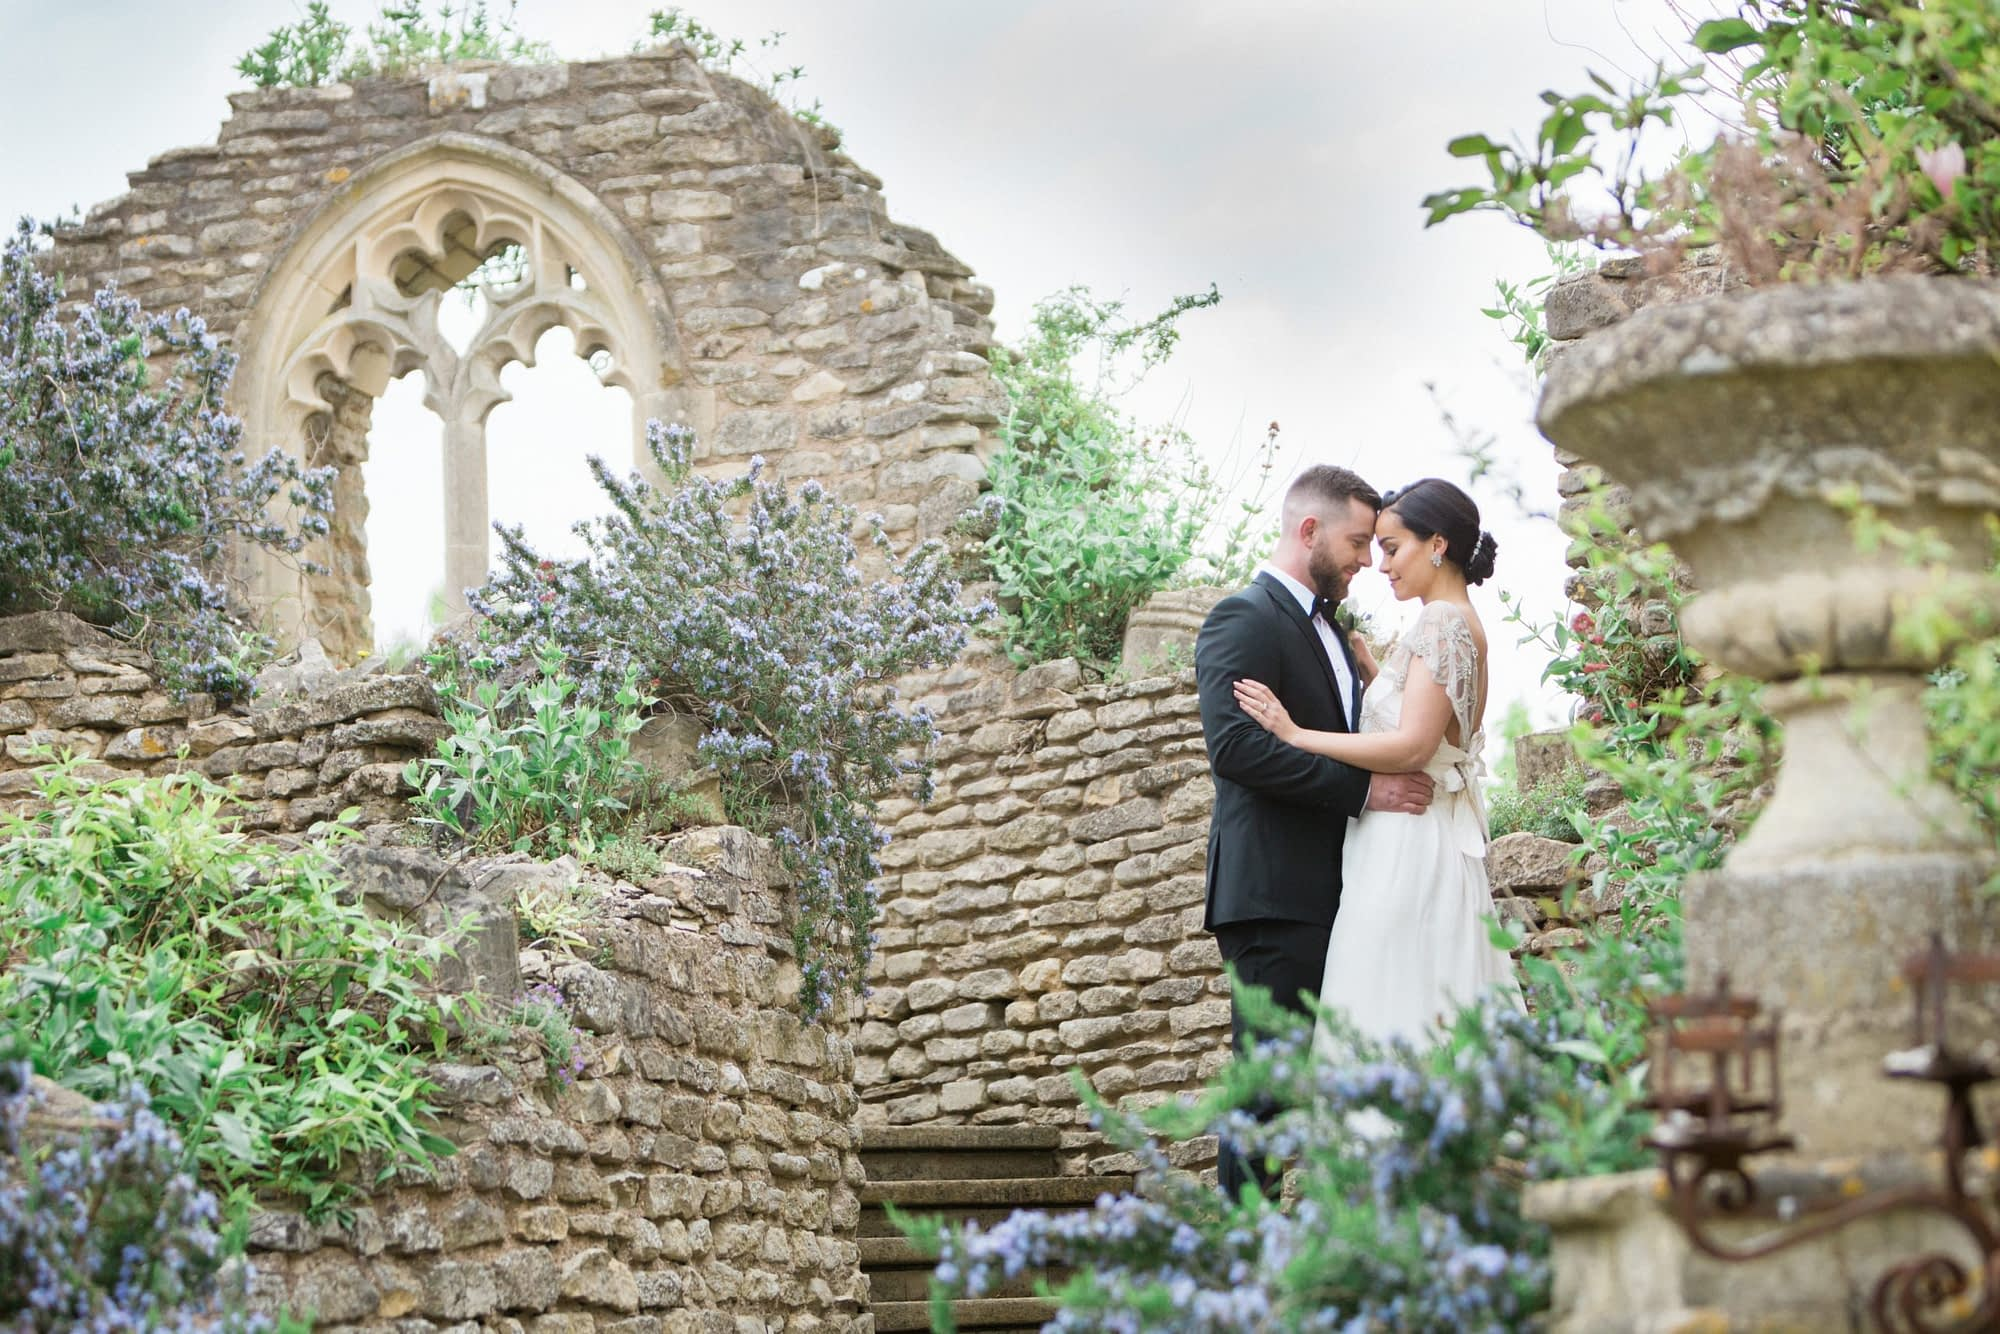 Euridge Manor wedding photographer Wiltshire